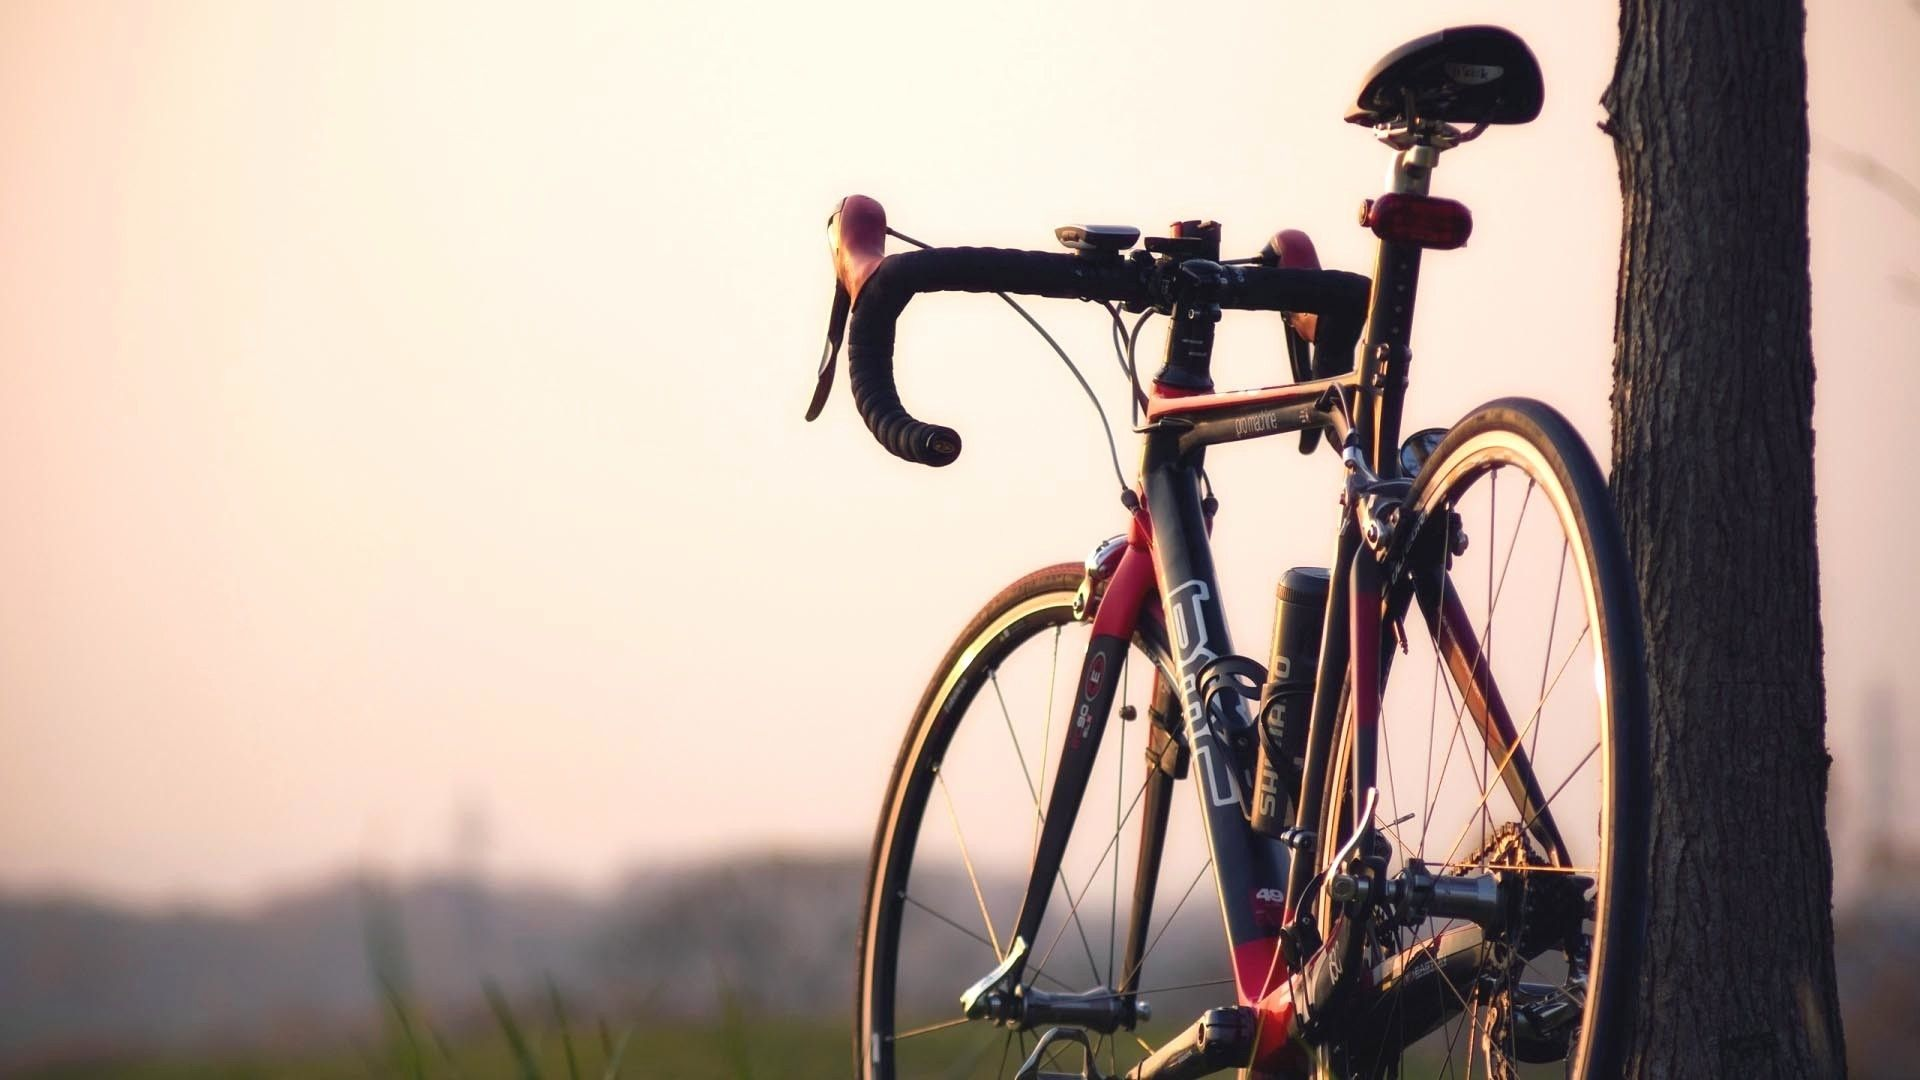 Road Bike Wallpapers Top Free Road Bike Backgrounds